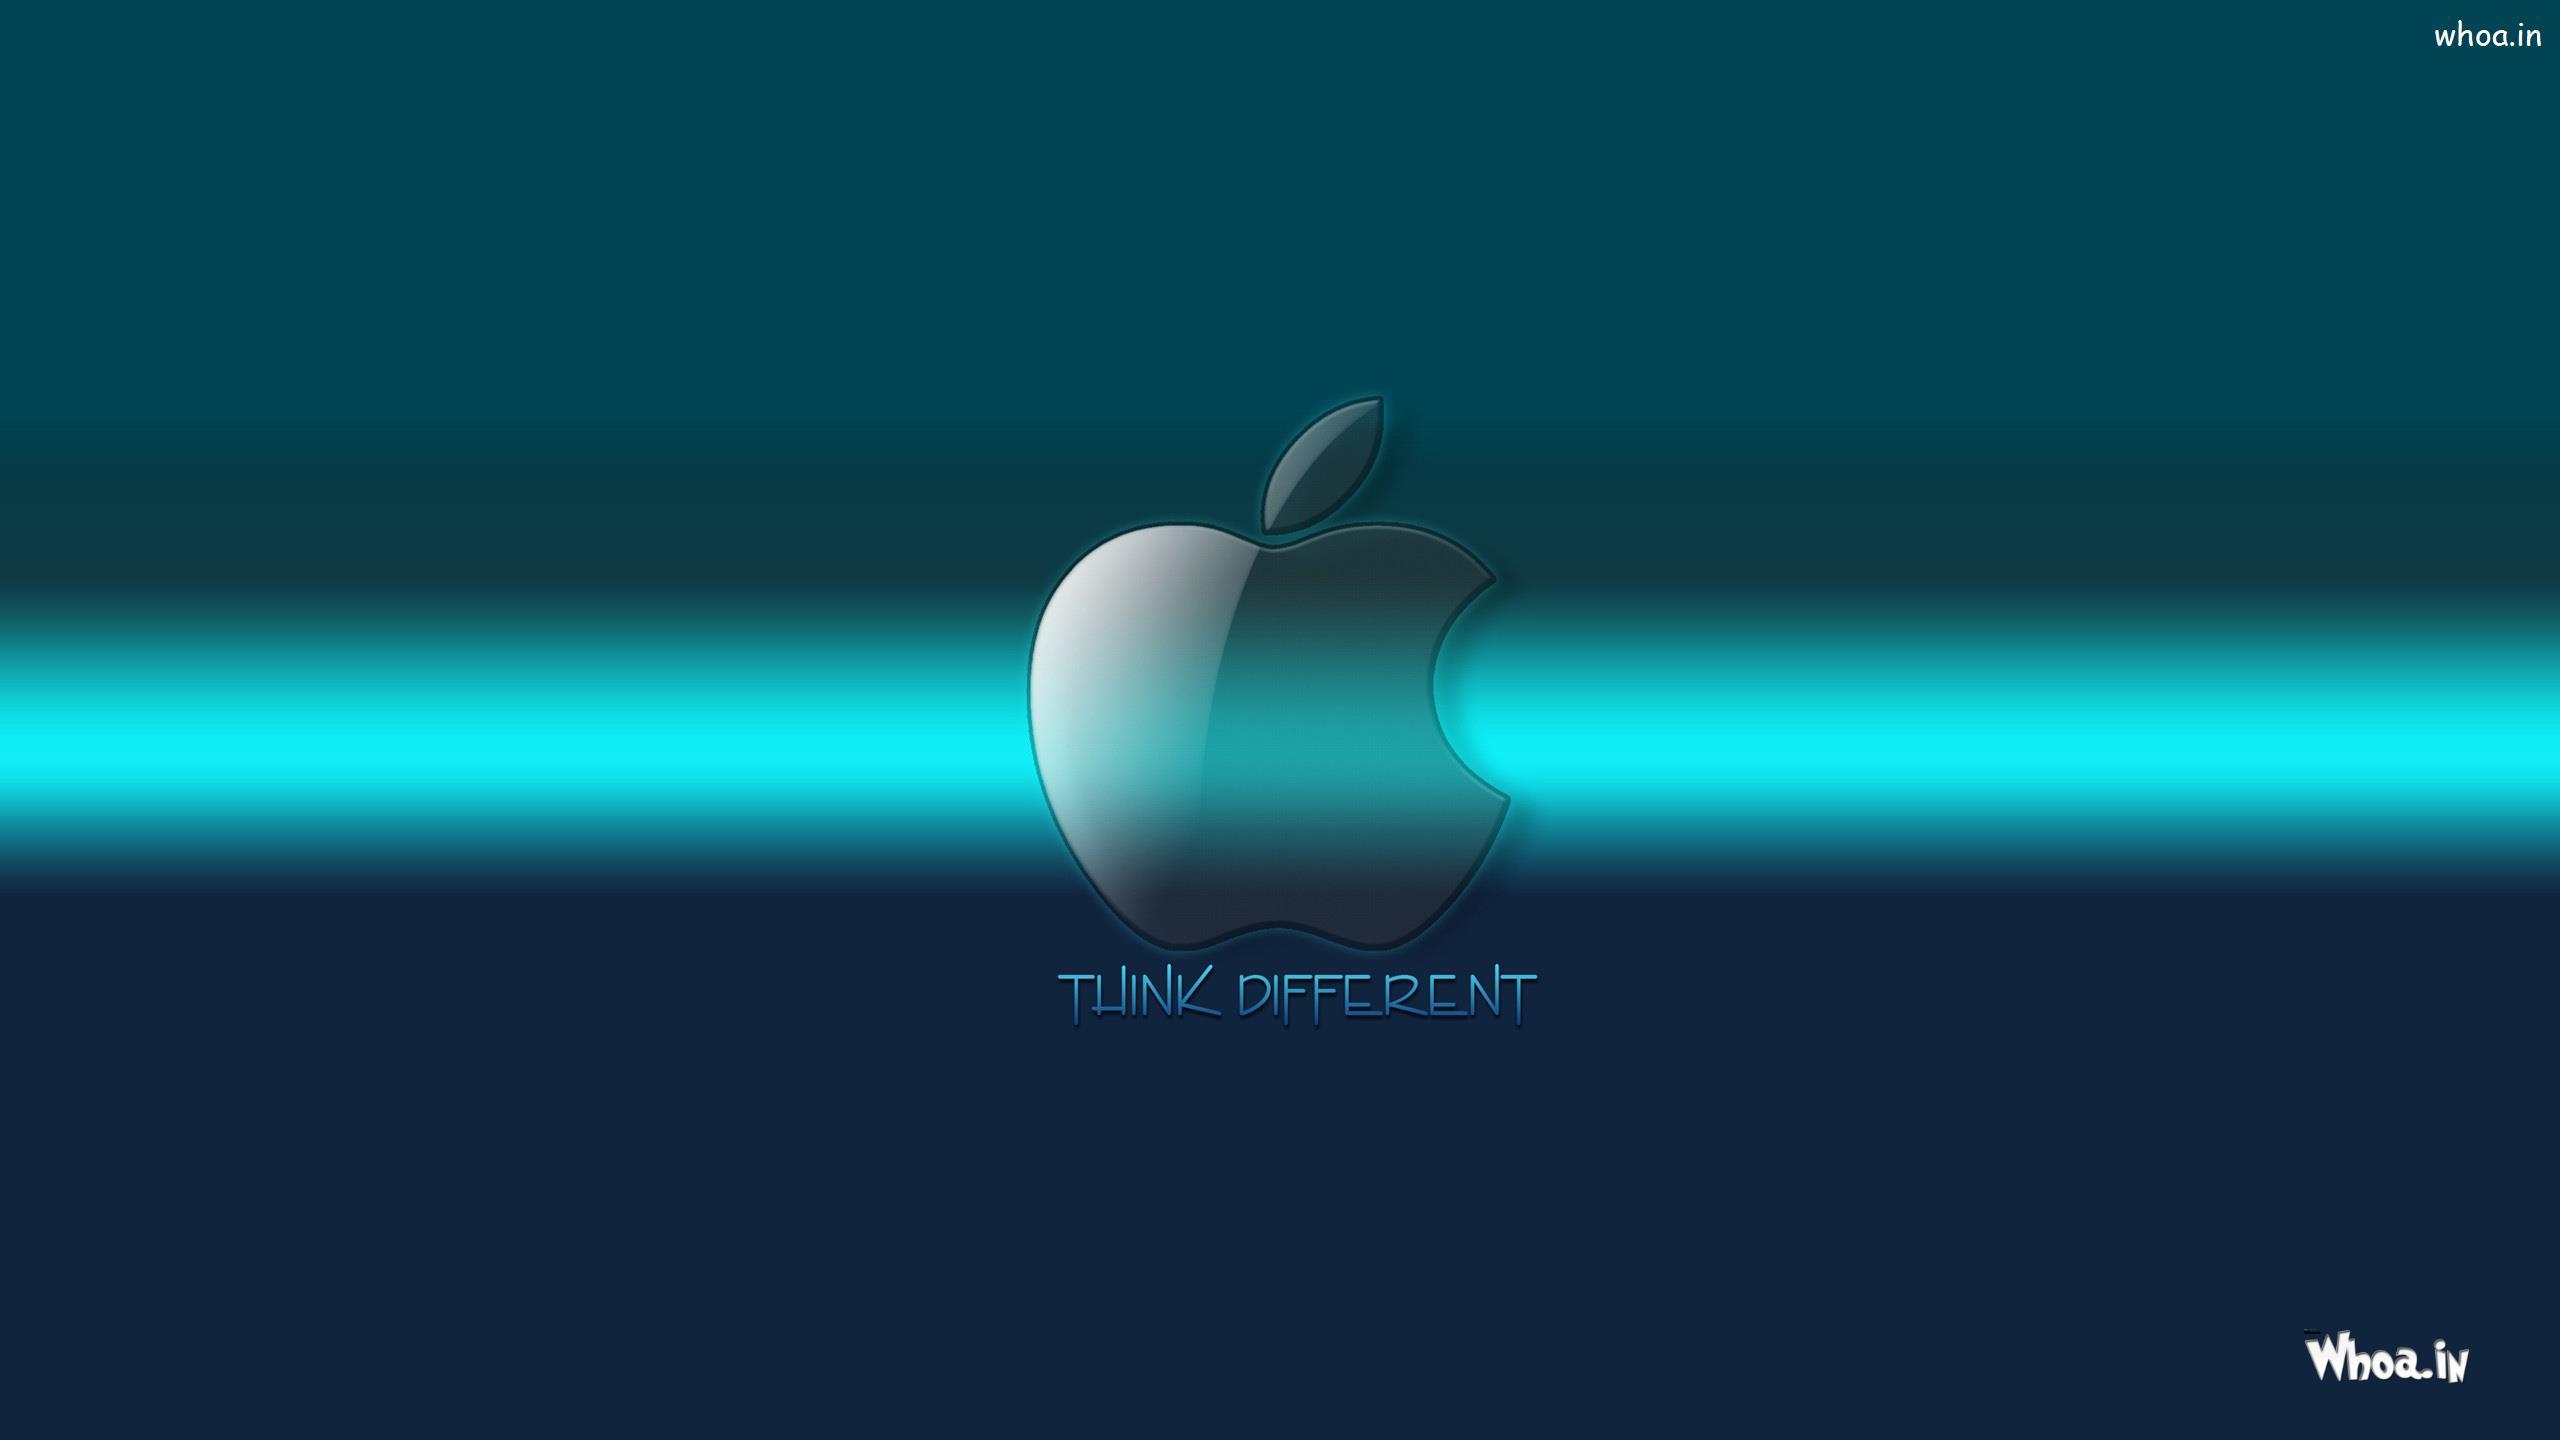 apple think different desktop wallpaper